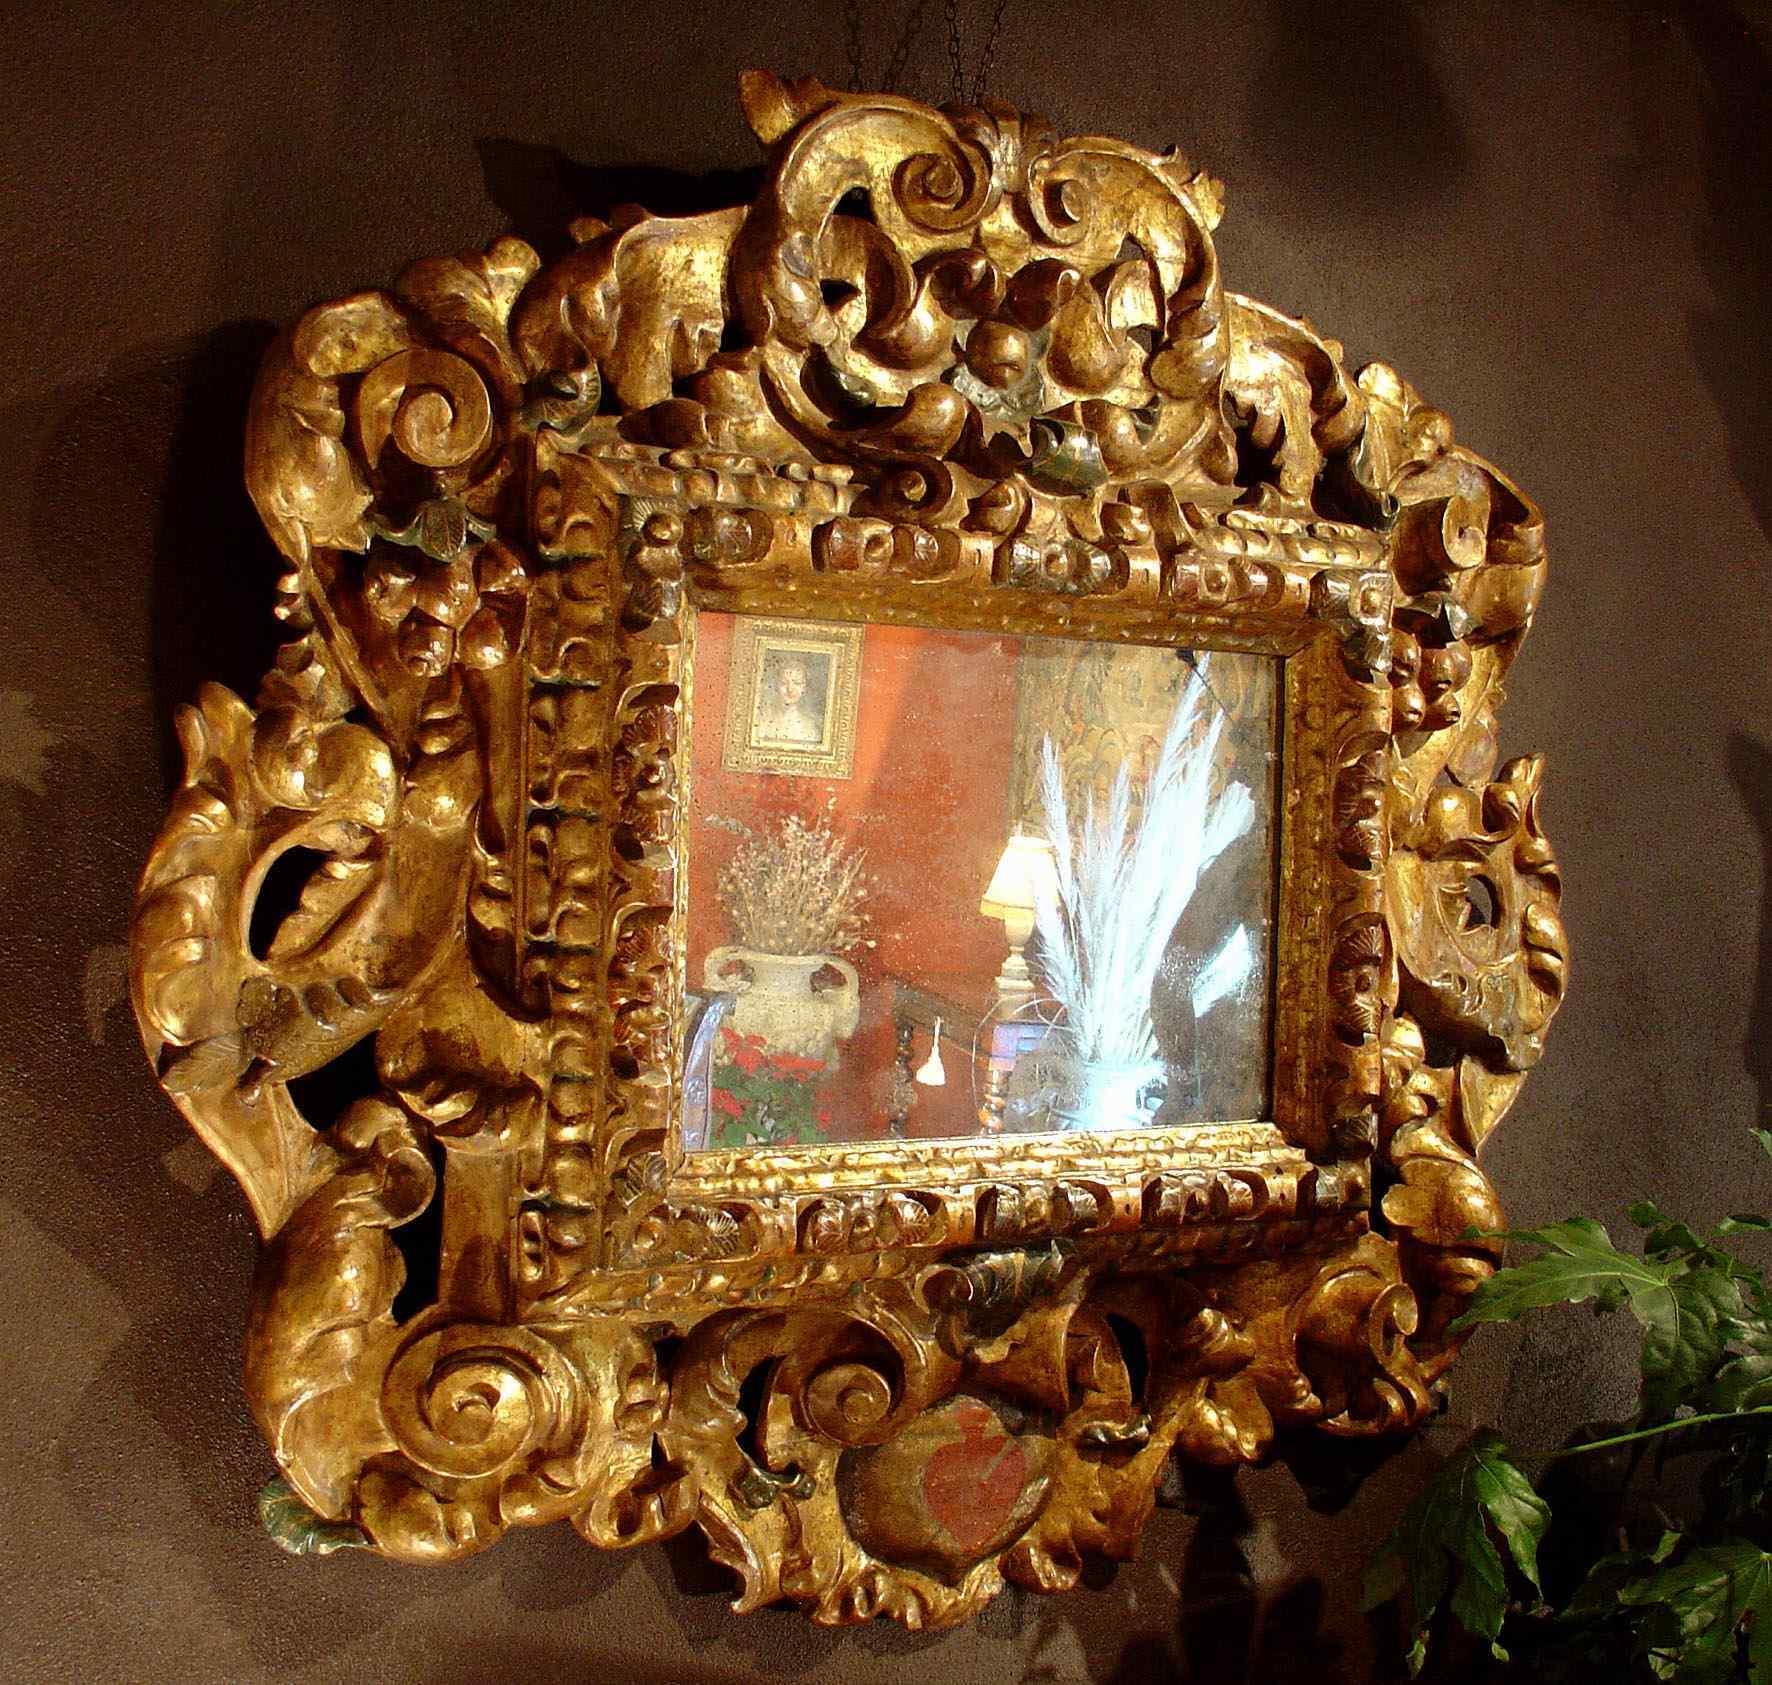 Grand miroir espagnol 17ème siècle